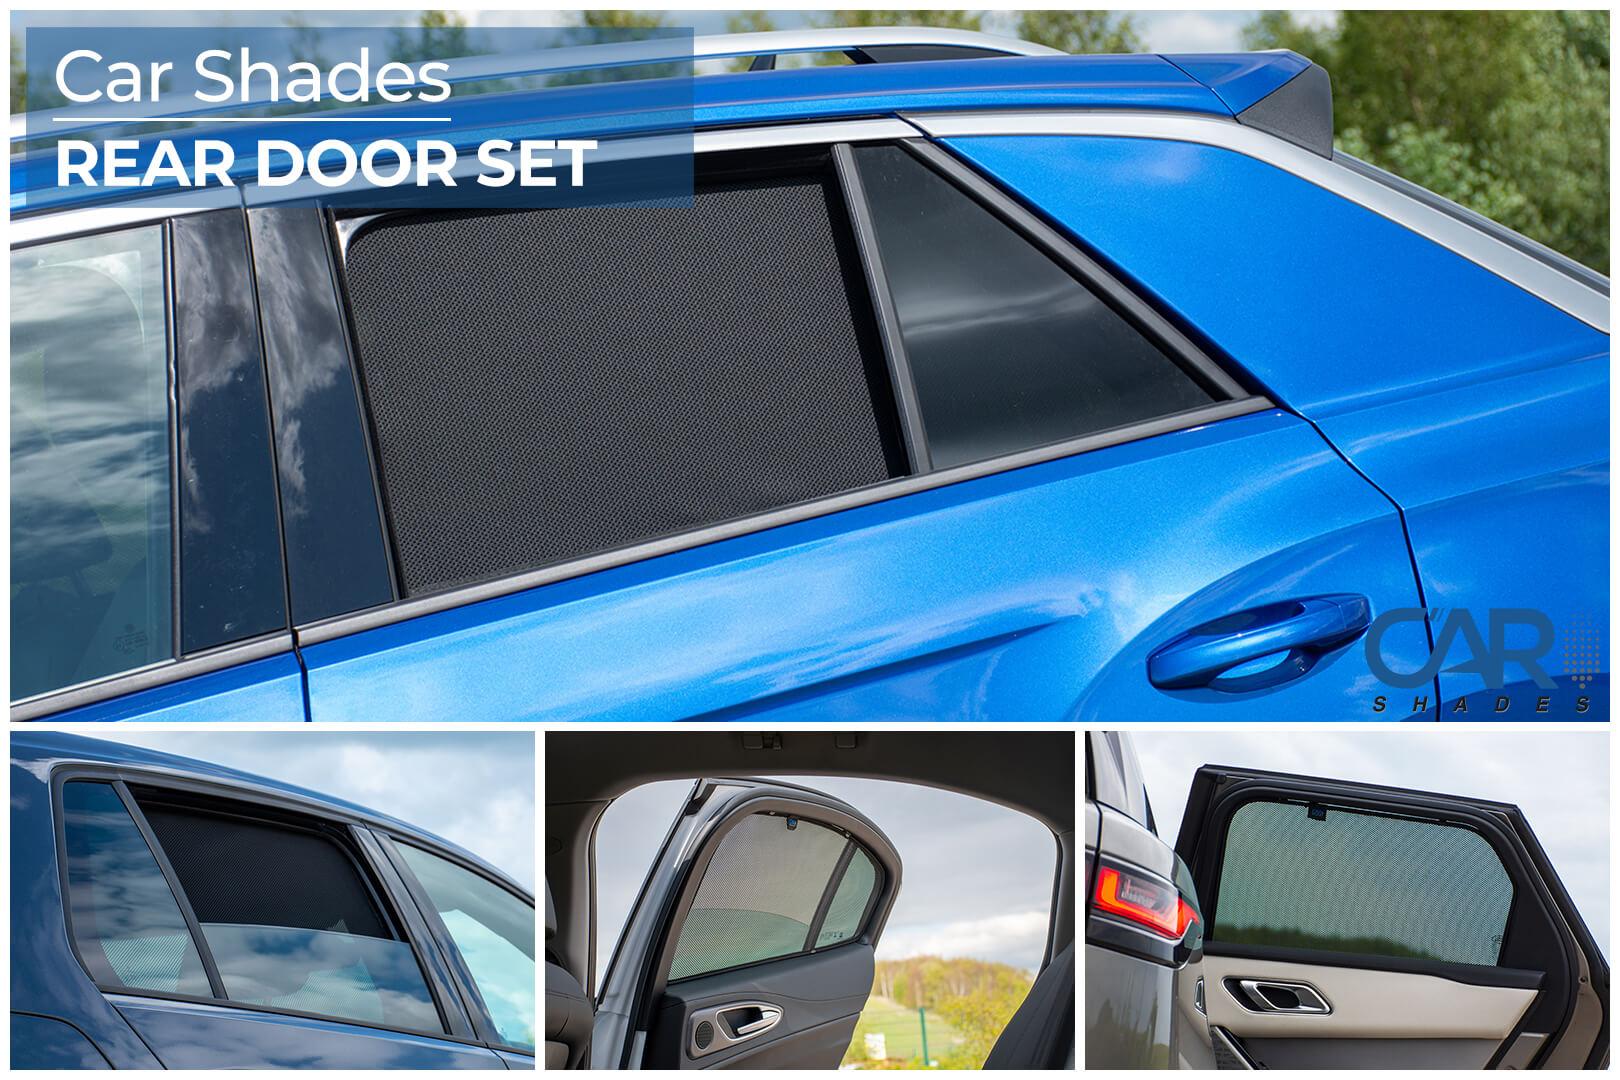 Car Shades - Rear Door Set